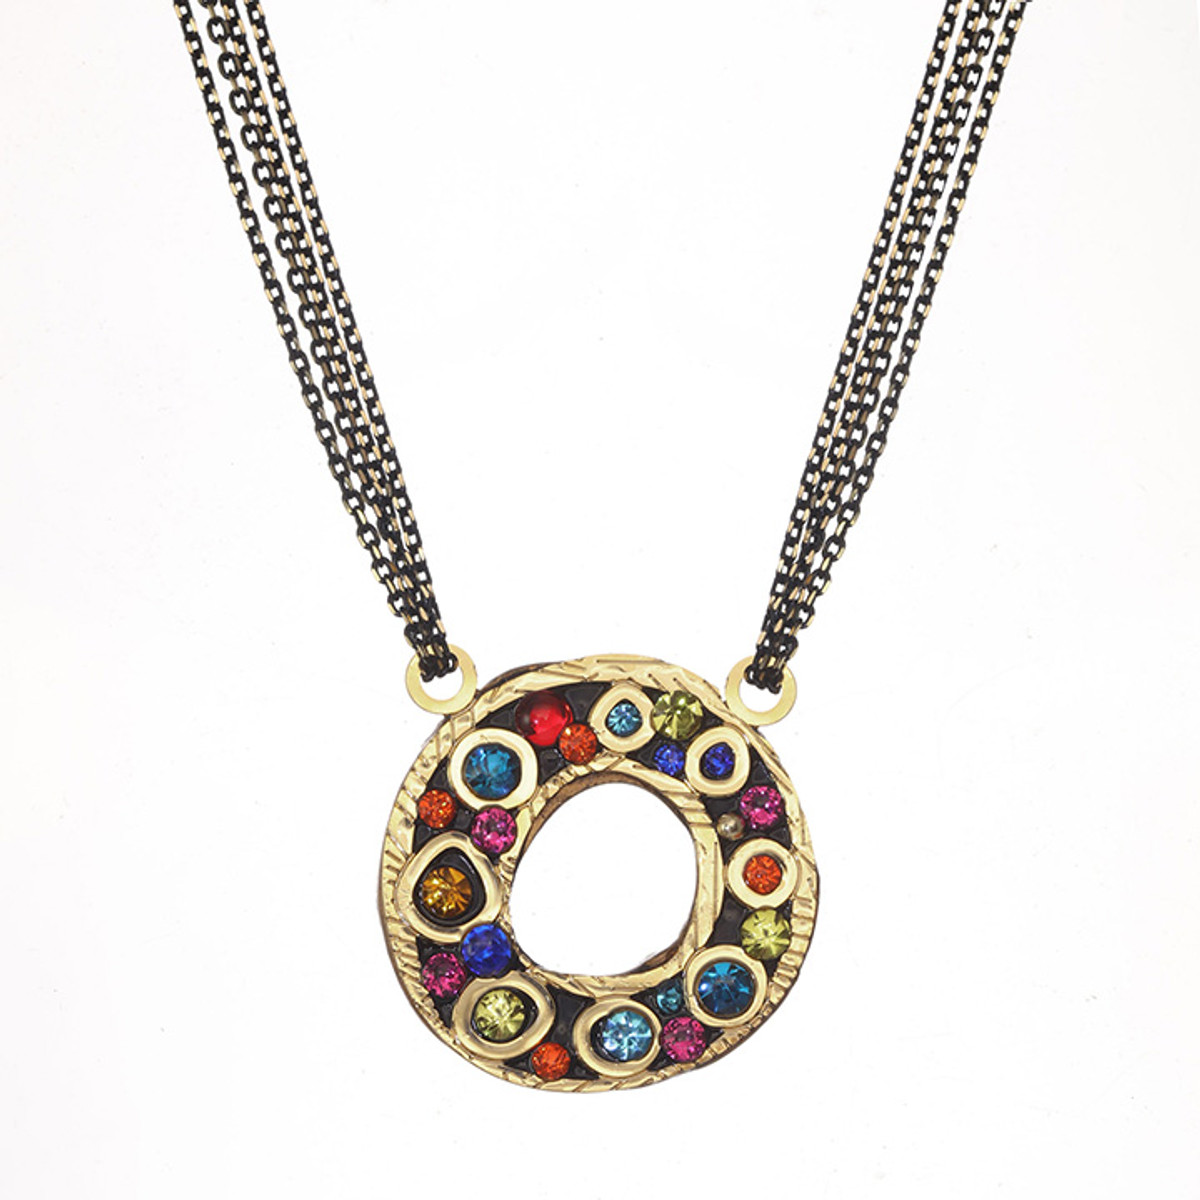 Michal Golan Michal Golan Cosmic Open Circle on Chain Necklace